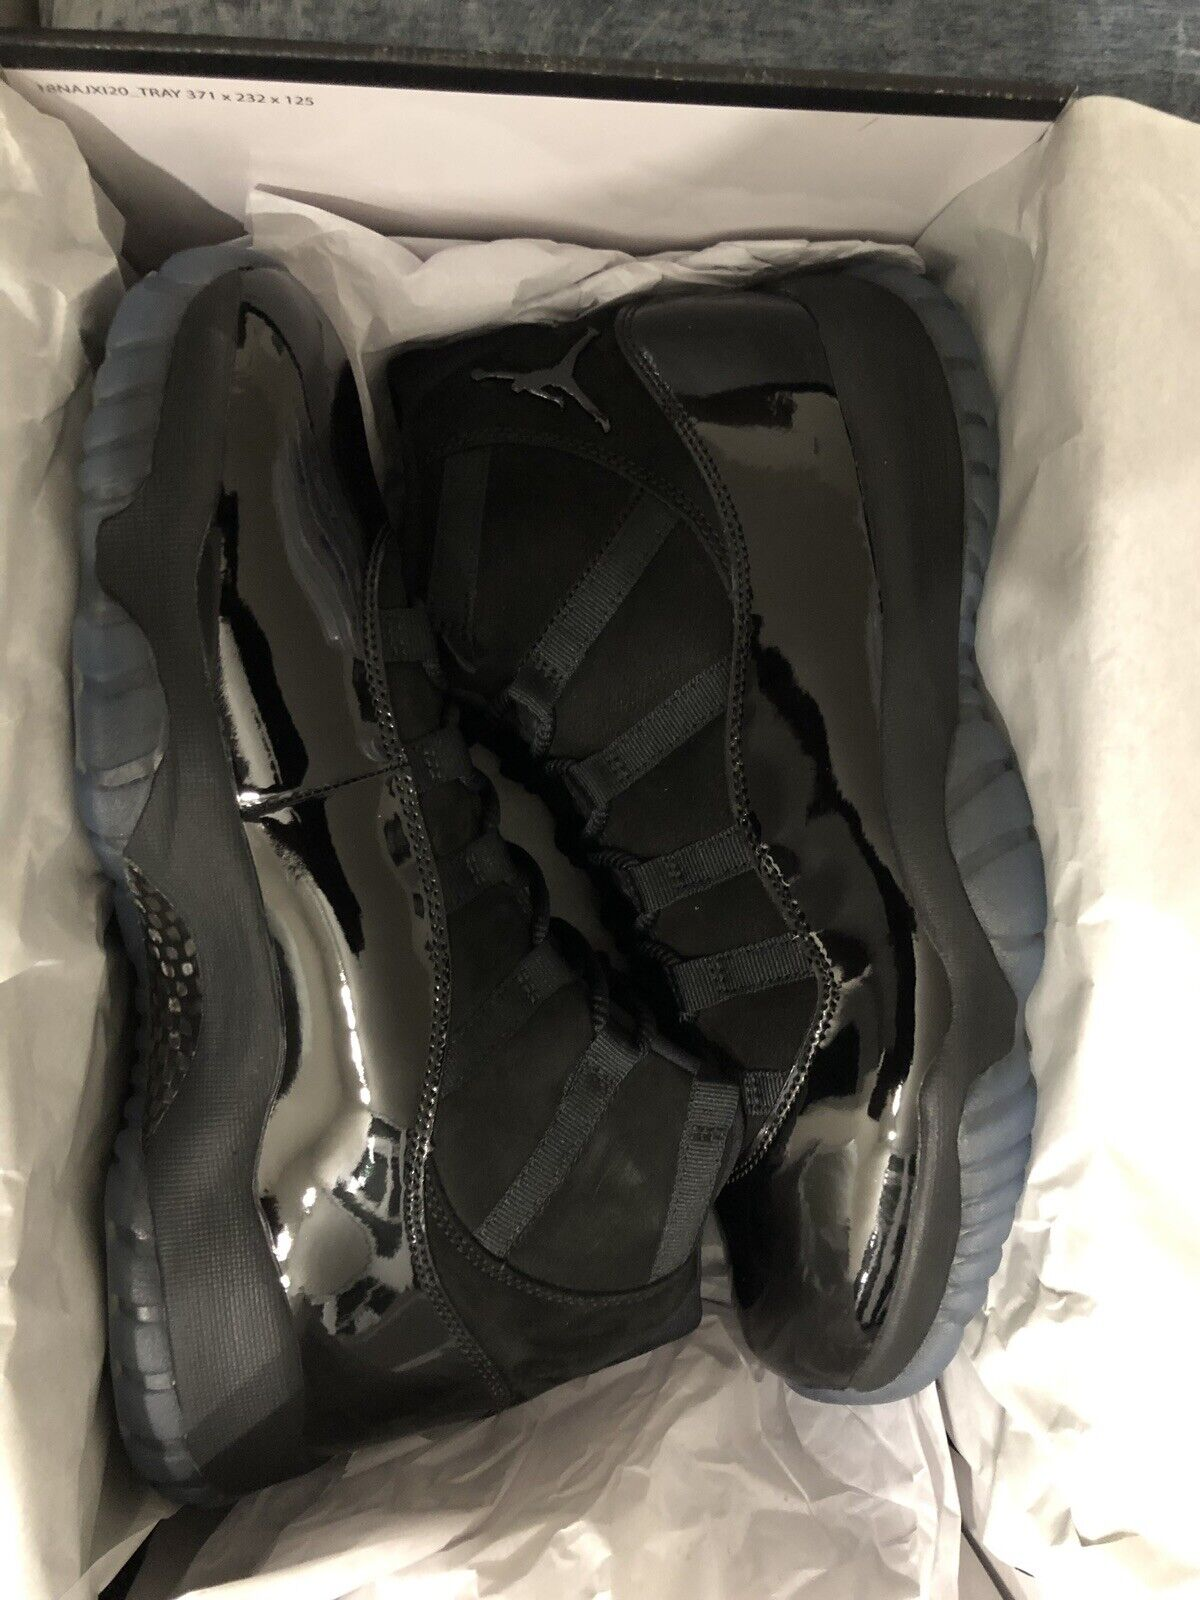 Nike Air Jordan 11 Retro XI Size 11 Black Black Black Black Black 378037 005 Cap and Gown 1d2b43